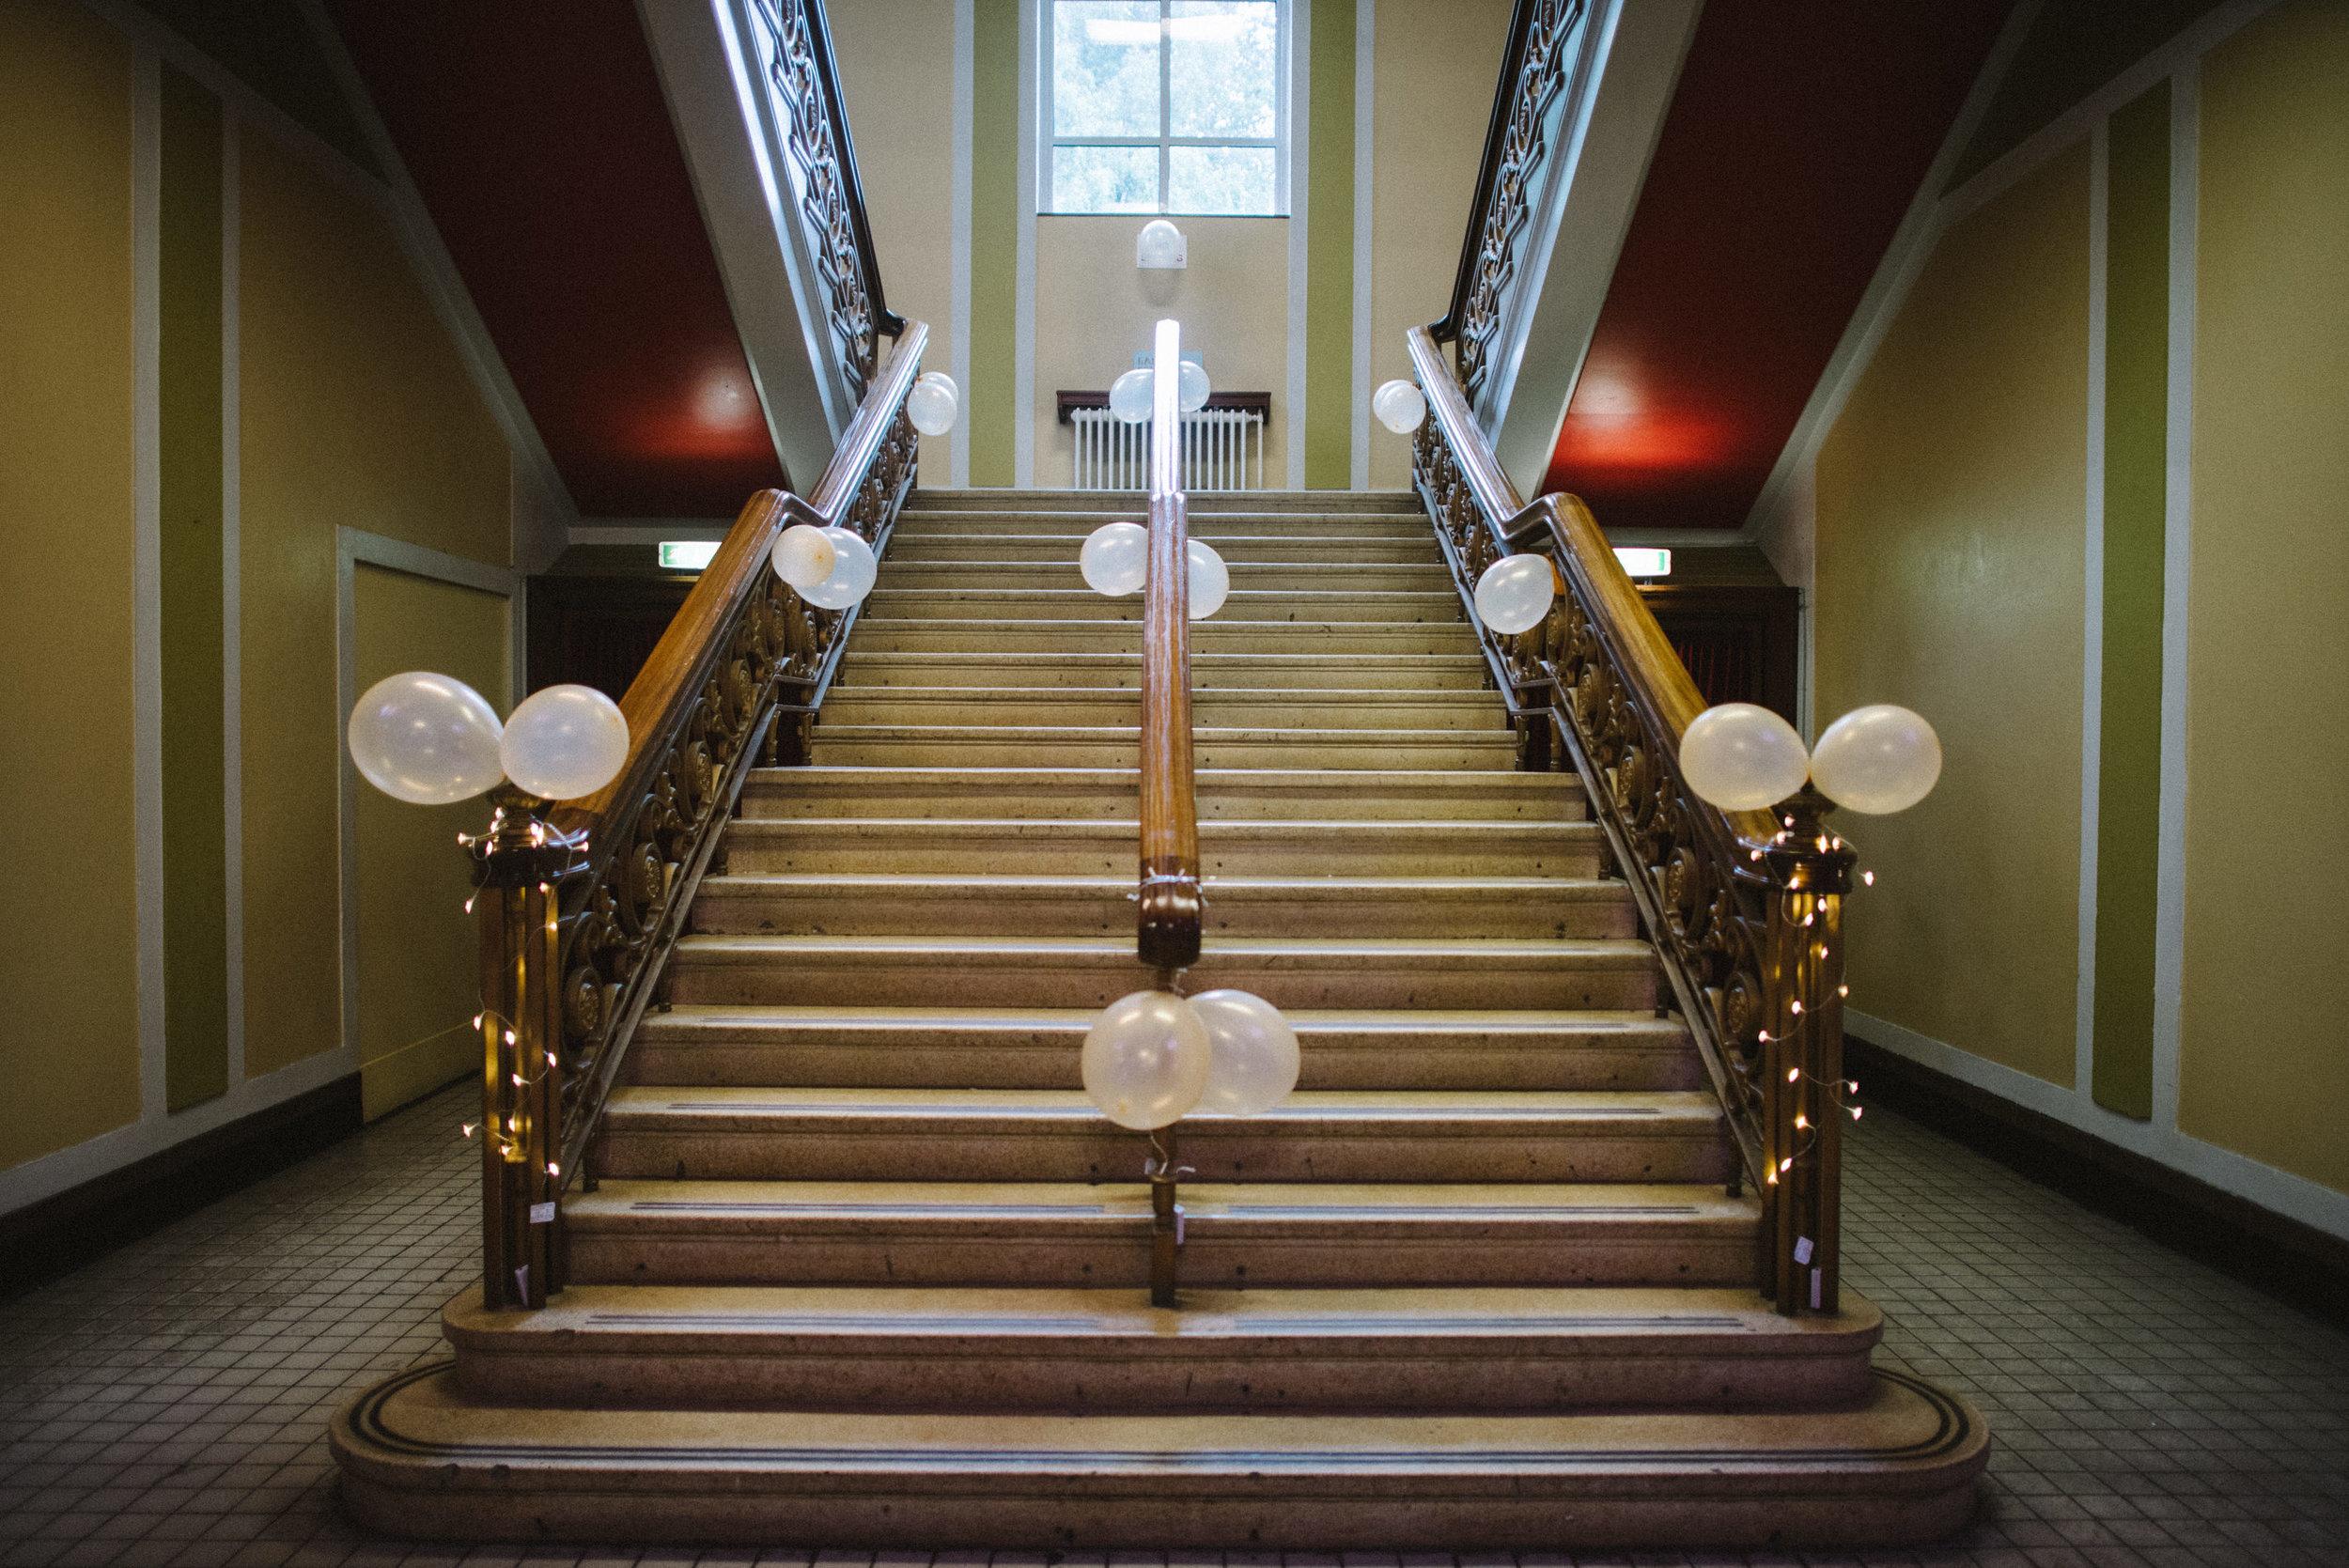 0163-LISA-DEVINE-PHOTOGRAPHY-ALTERNATIVE-WEDDING-PHOTOGRAPHY-SCOTLAND-DESTINATION-WEDDINGS-GLASGOW-WEDDINGS-COOL-WEDDINGS-STYLISH-WEDDINGS.JPG